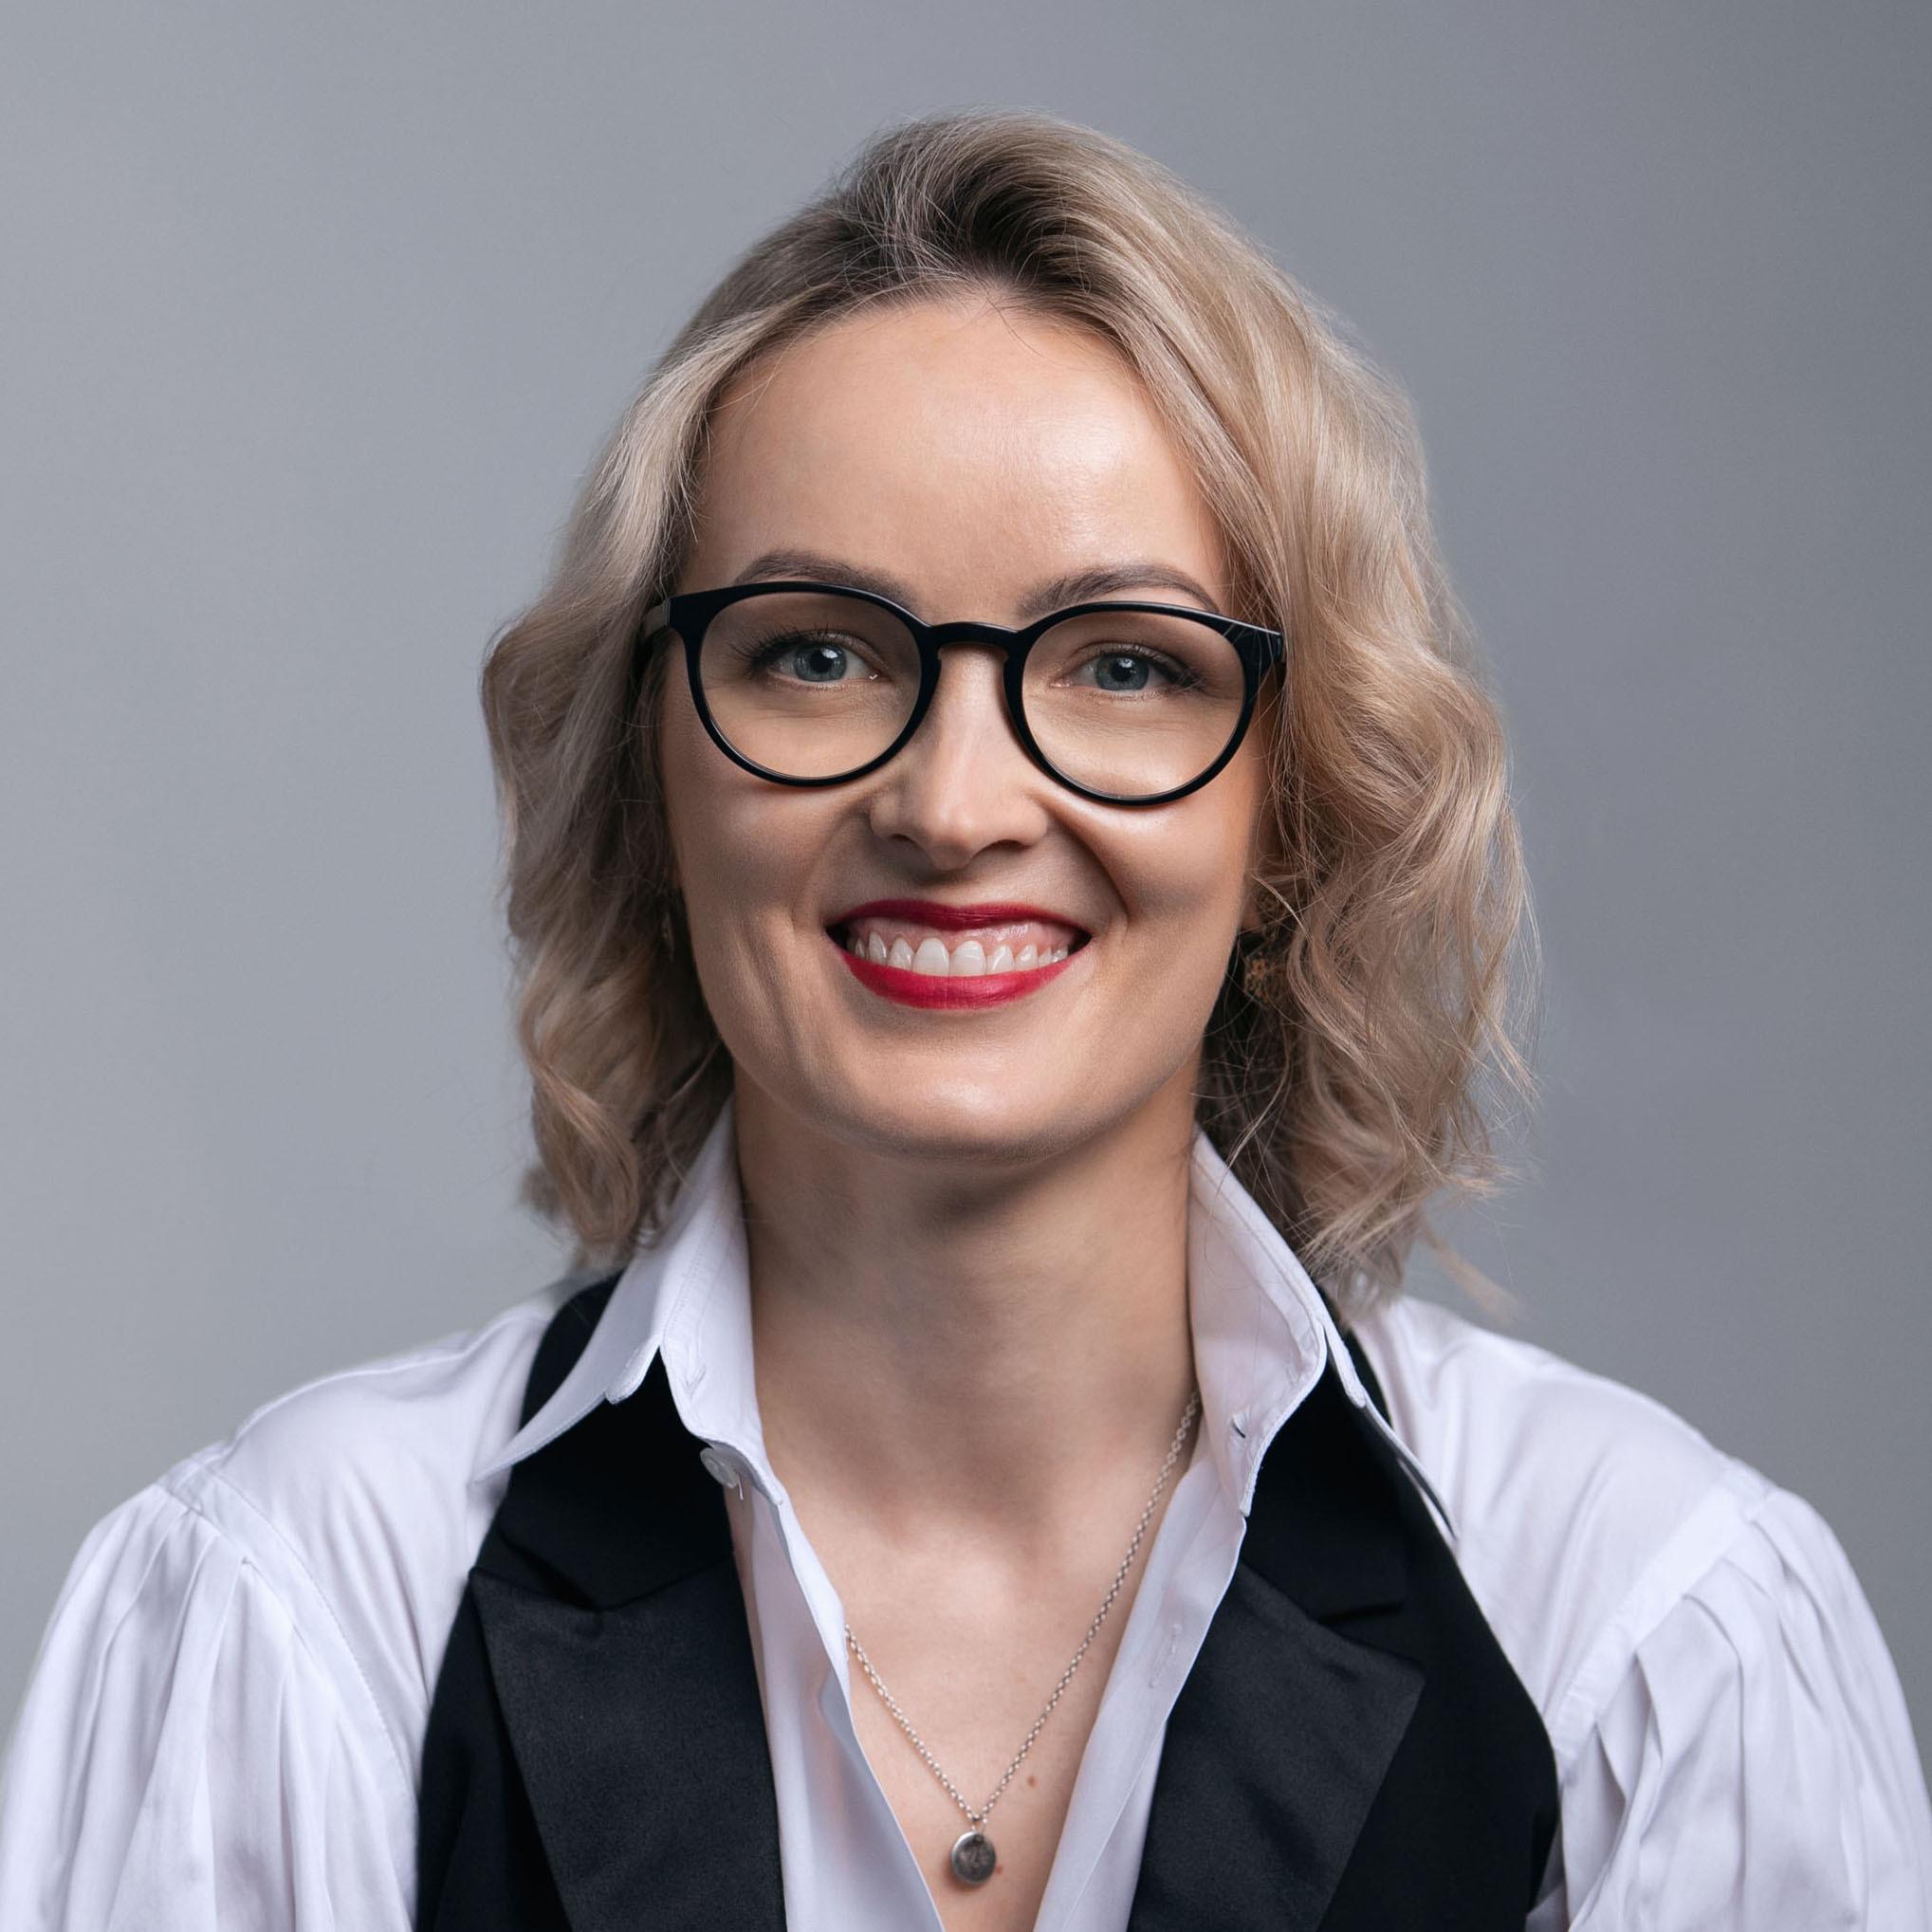 Laura Seryte